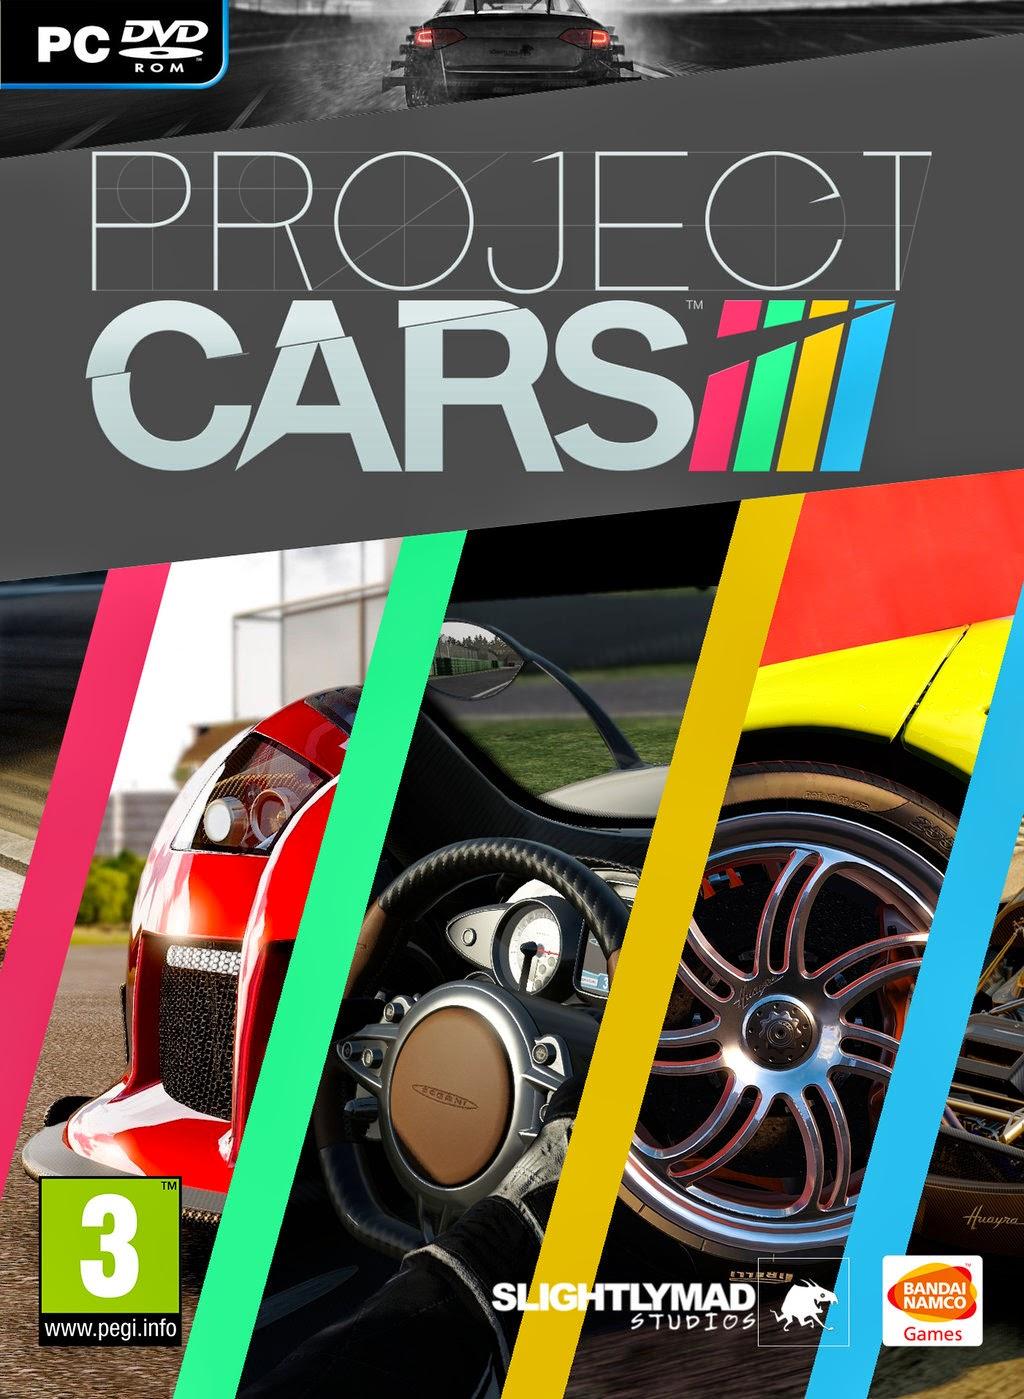 Project CARS ESPAÑOL PC Full Cover Caratula